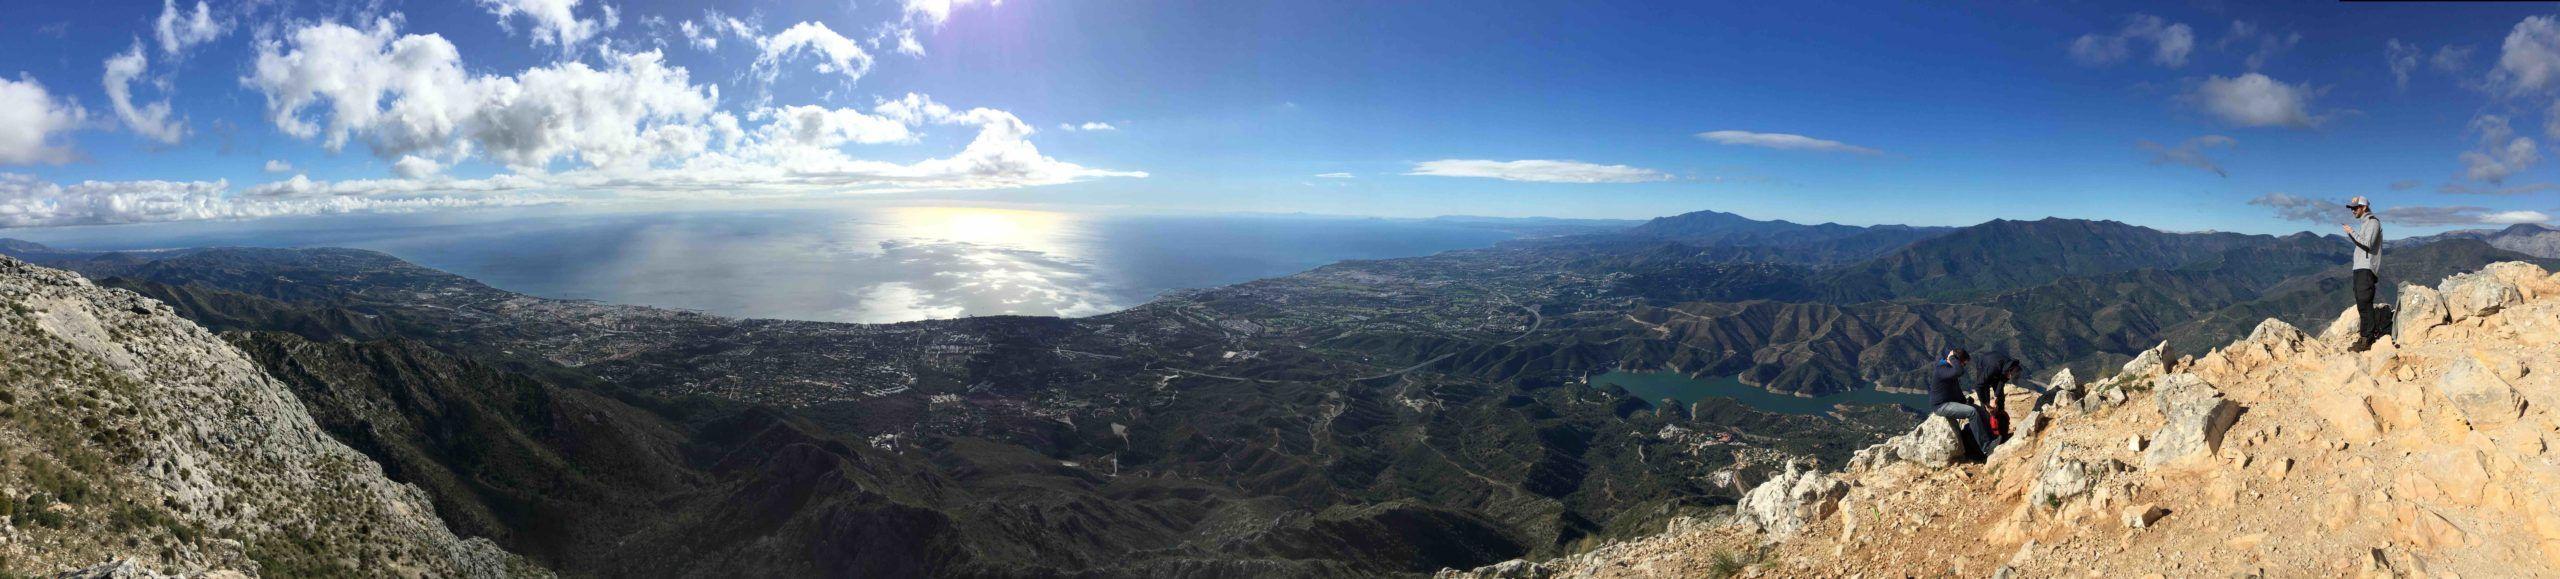 Hiking the La Concha mountain_view